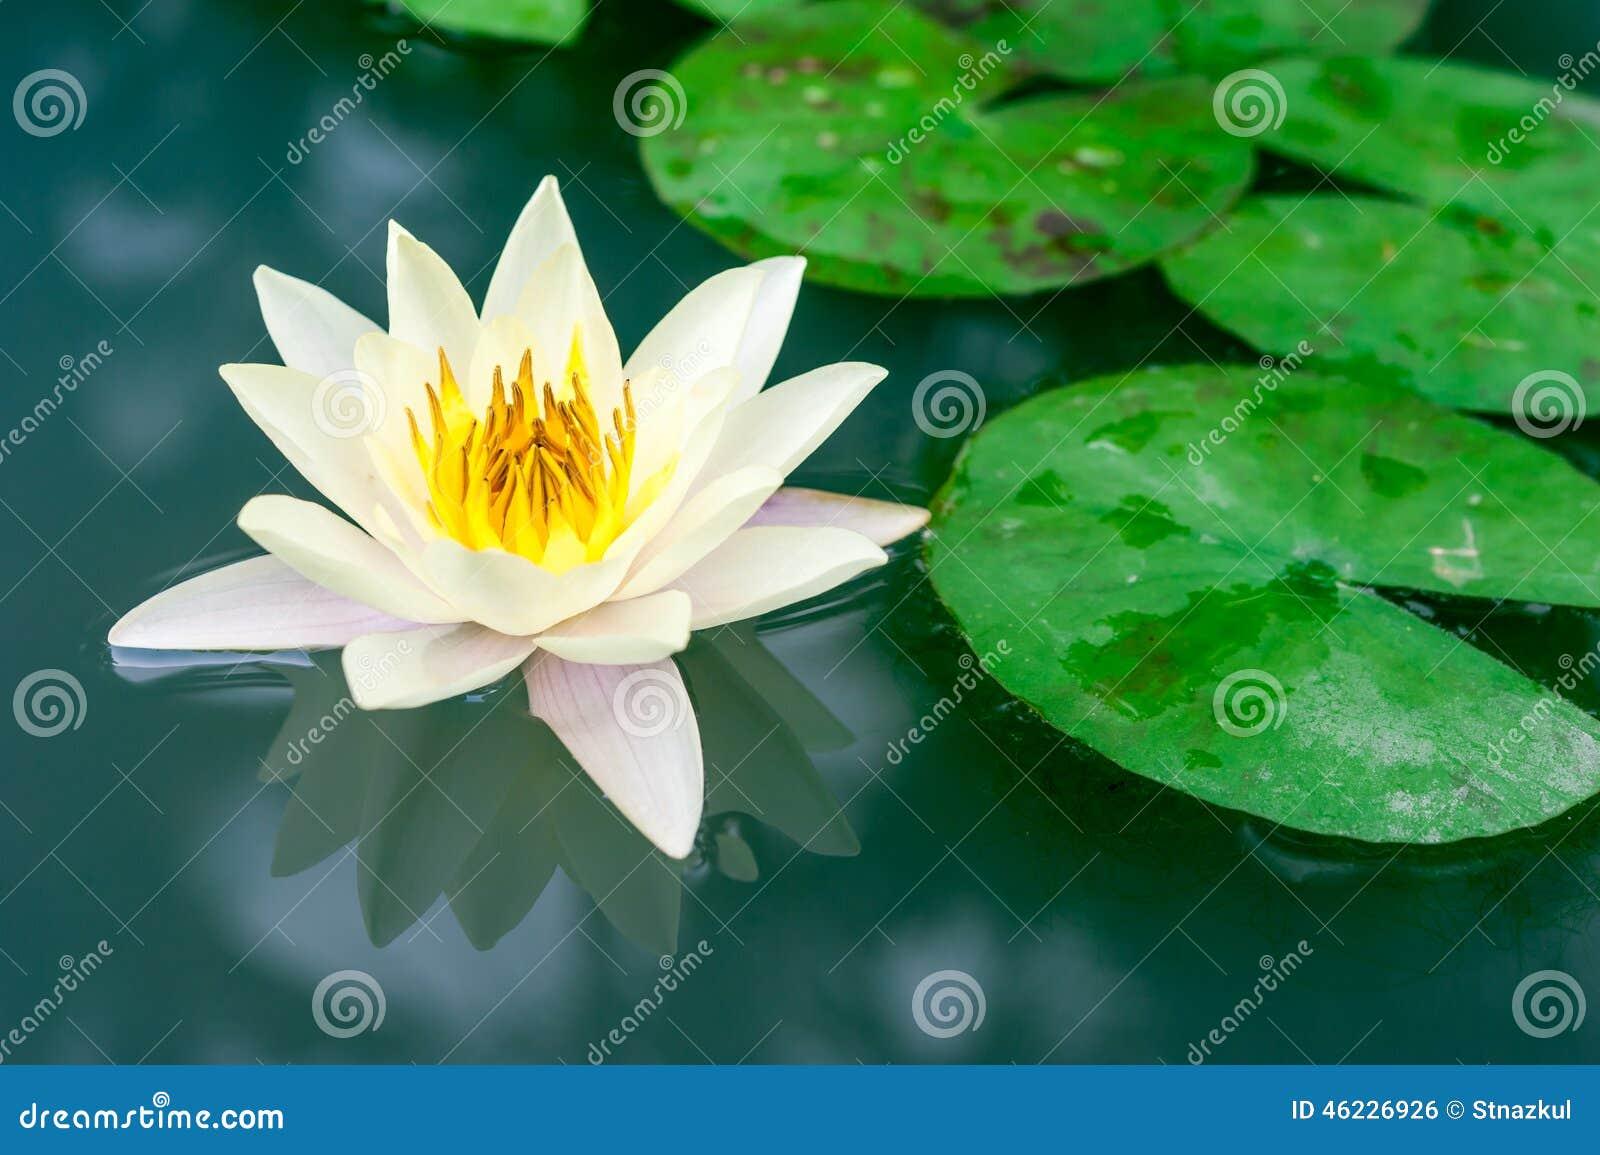 Beautiful Yellow Lotus Flower In Pond Stock Photo Image Of Pool